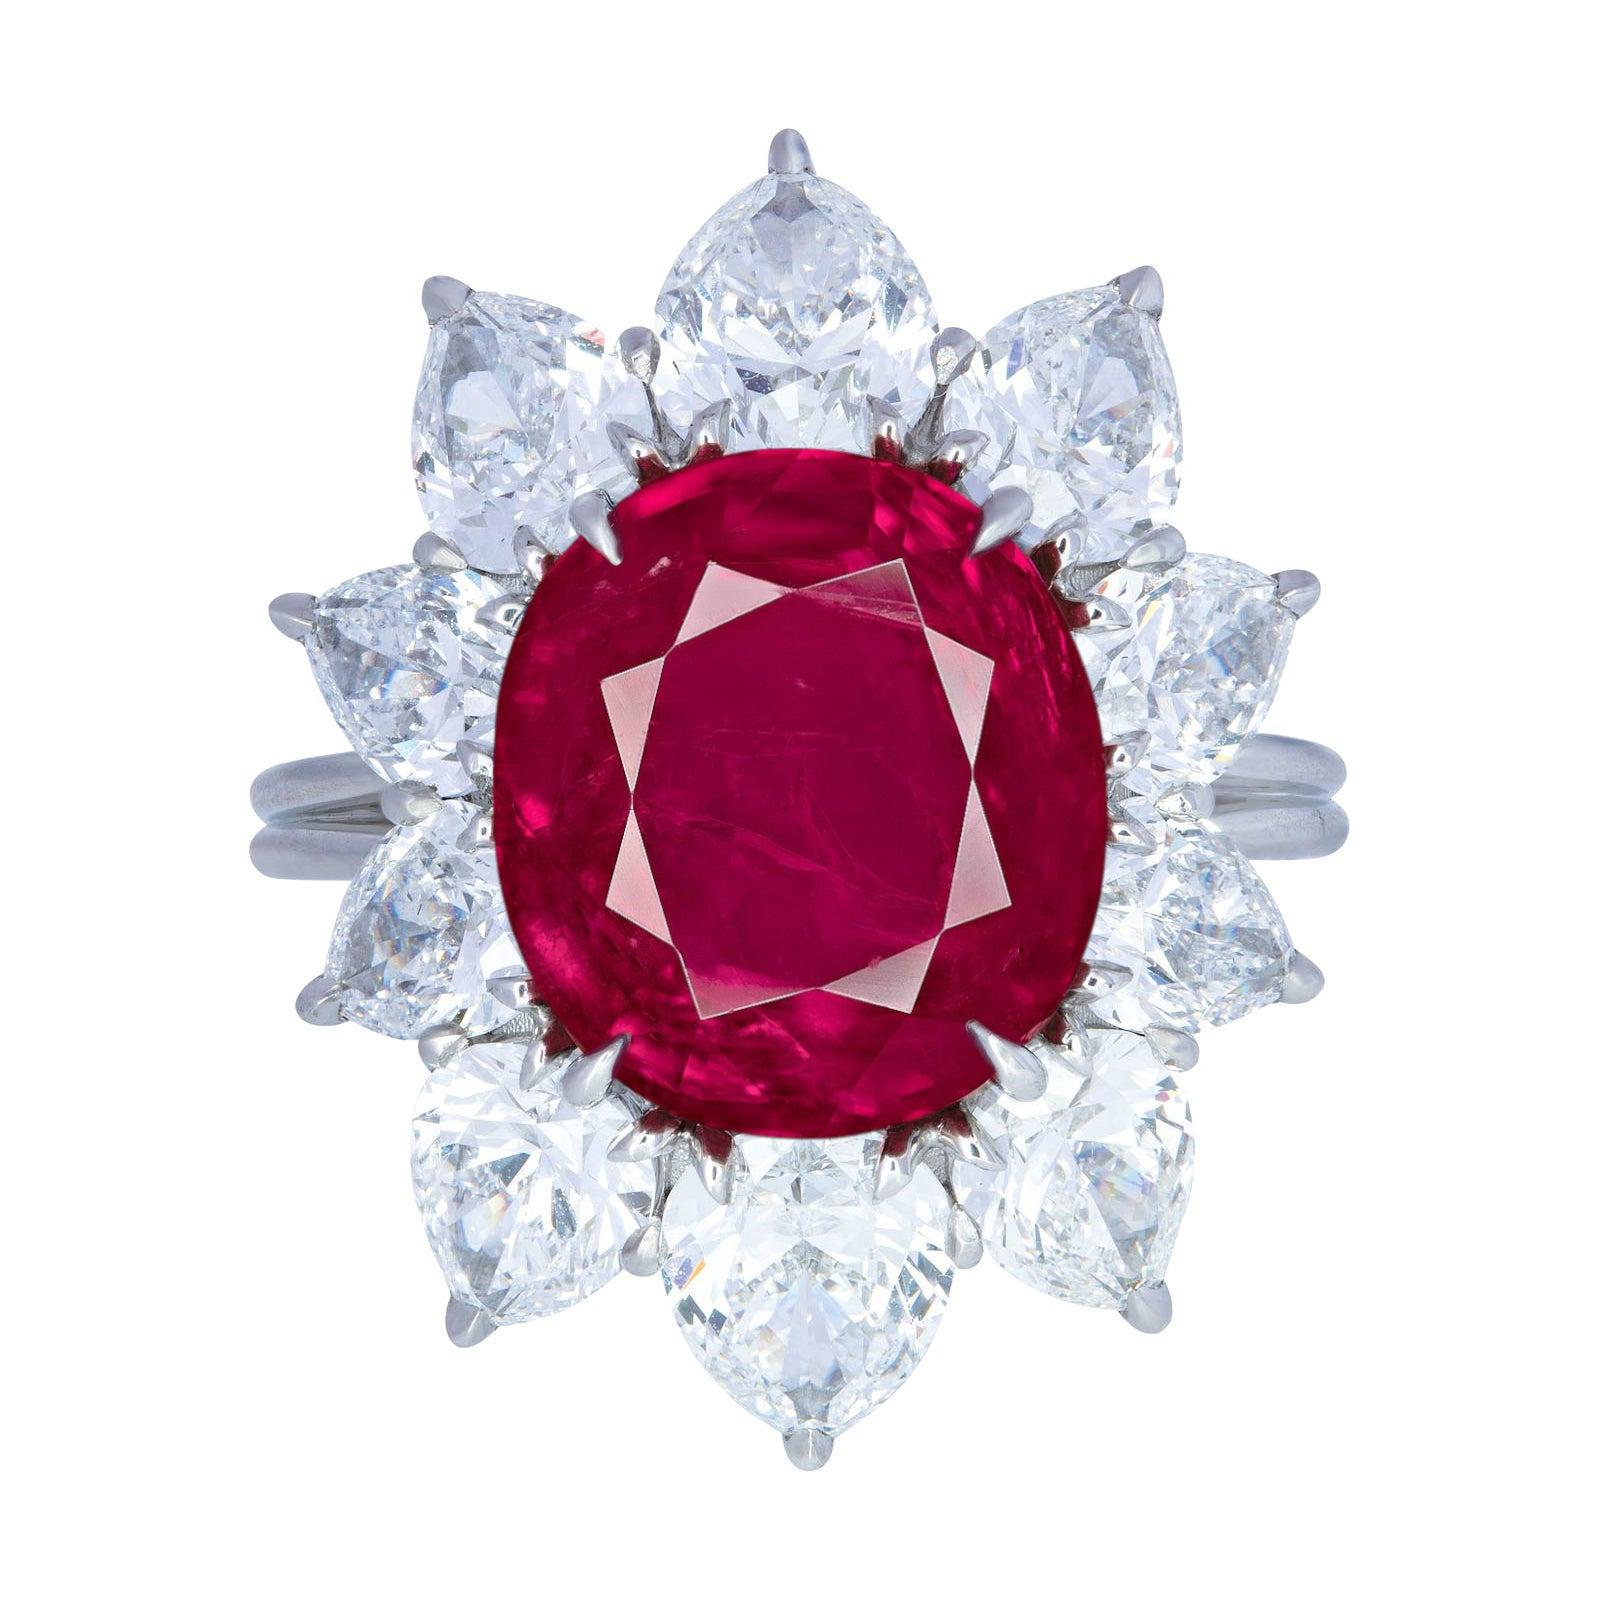 GRS Switzerland GIA Certified Burma Burmese No Heat Ruby Diamond Cocktail Ring